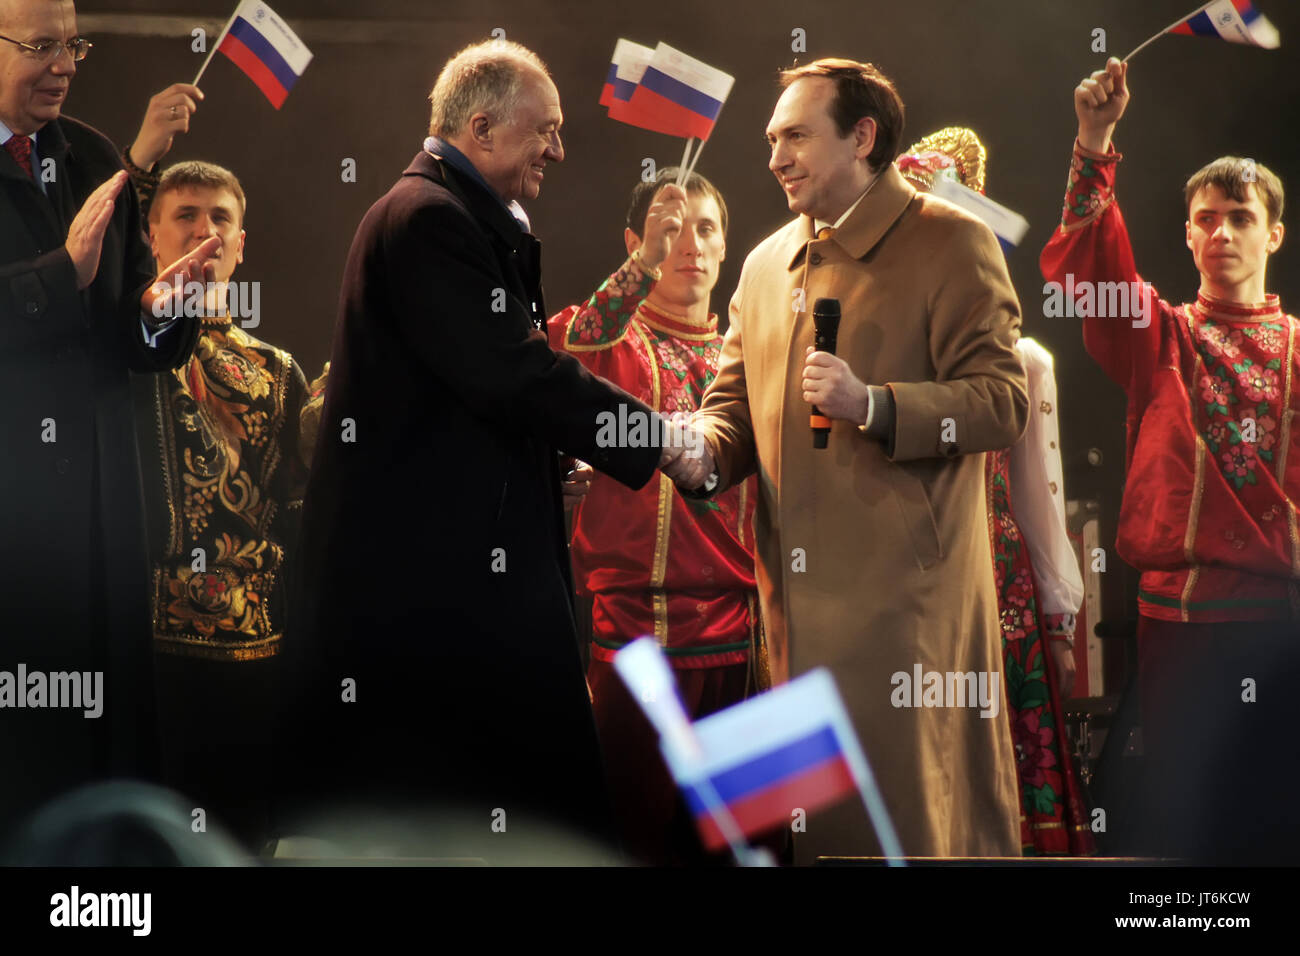 Ken Livingstone MP (L) greets Vyaceslav Nikonov (R), General Director of Russkiy Mir at the 4th Annual Russian Winter Festival in Trafalgar Square, London, UK. - Stock Image